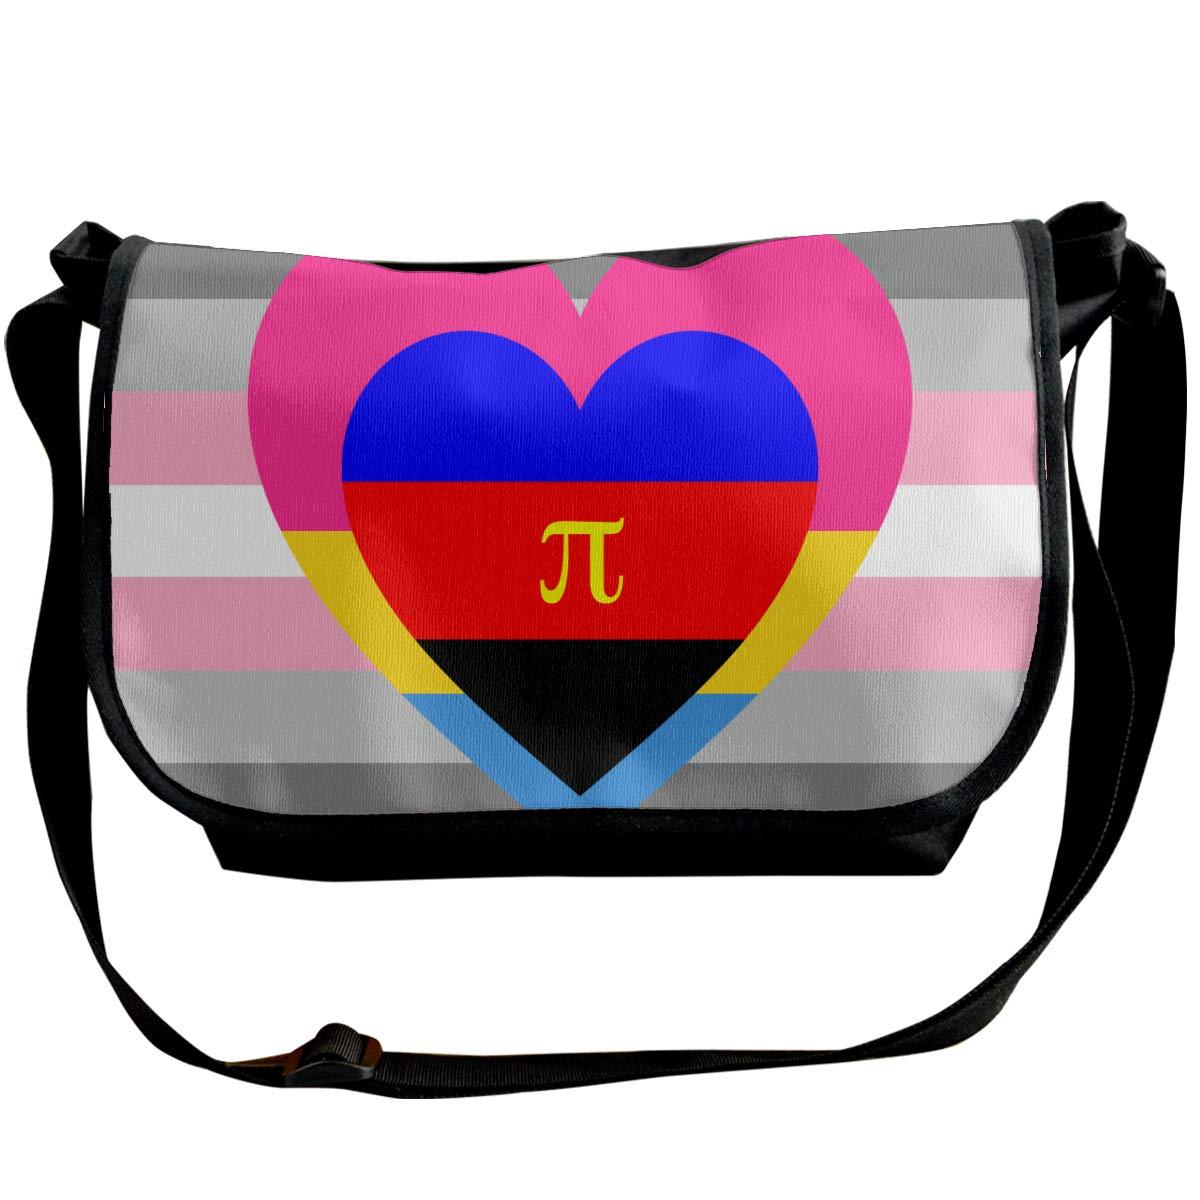 Futong Huaxia Pansexual Feminine Polyamorous by Pride Flags Travel Messenger Bags Handbag Shoulder Bag Crossbody Bag Unisex